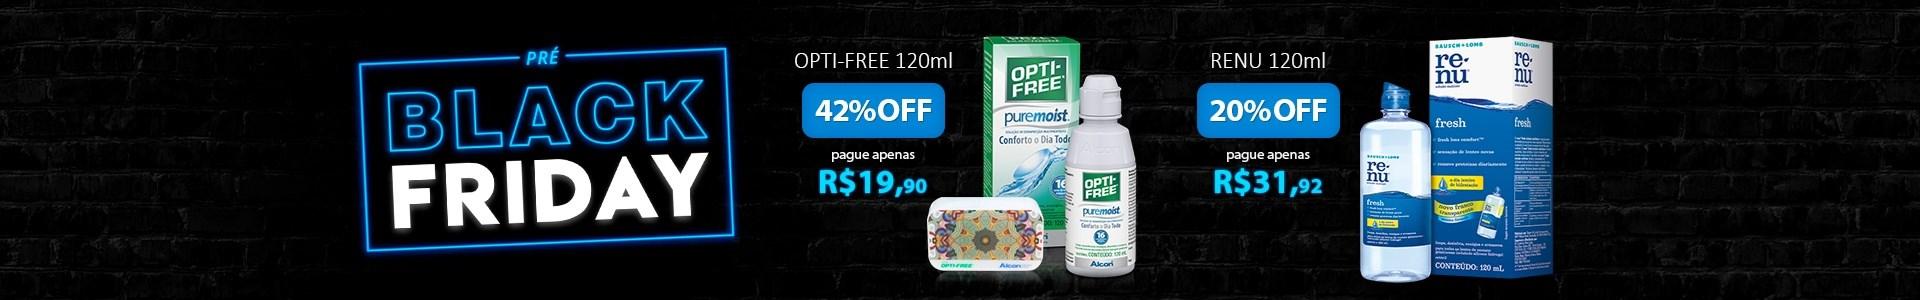 Pre Black Friday NewLentes - Opti-Free